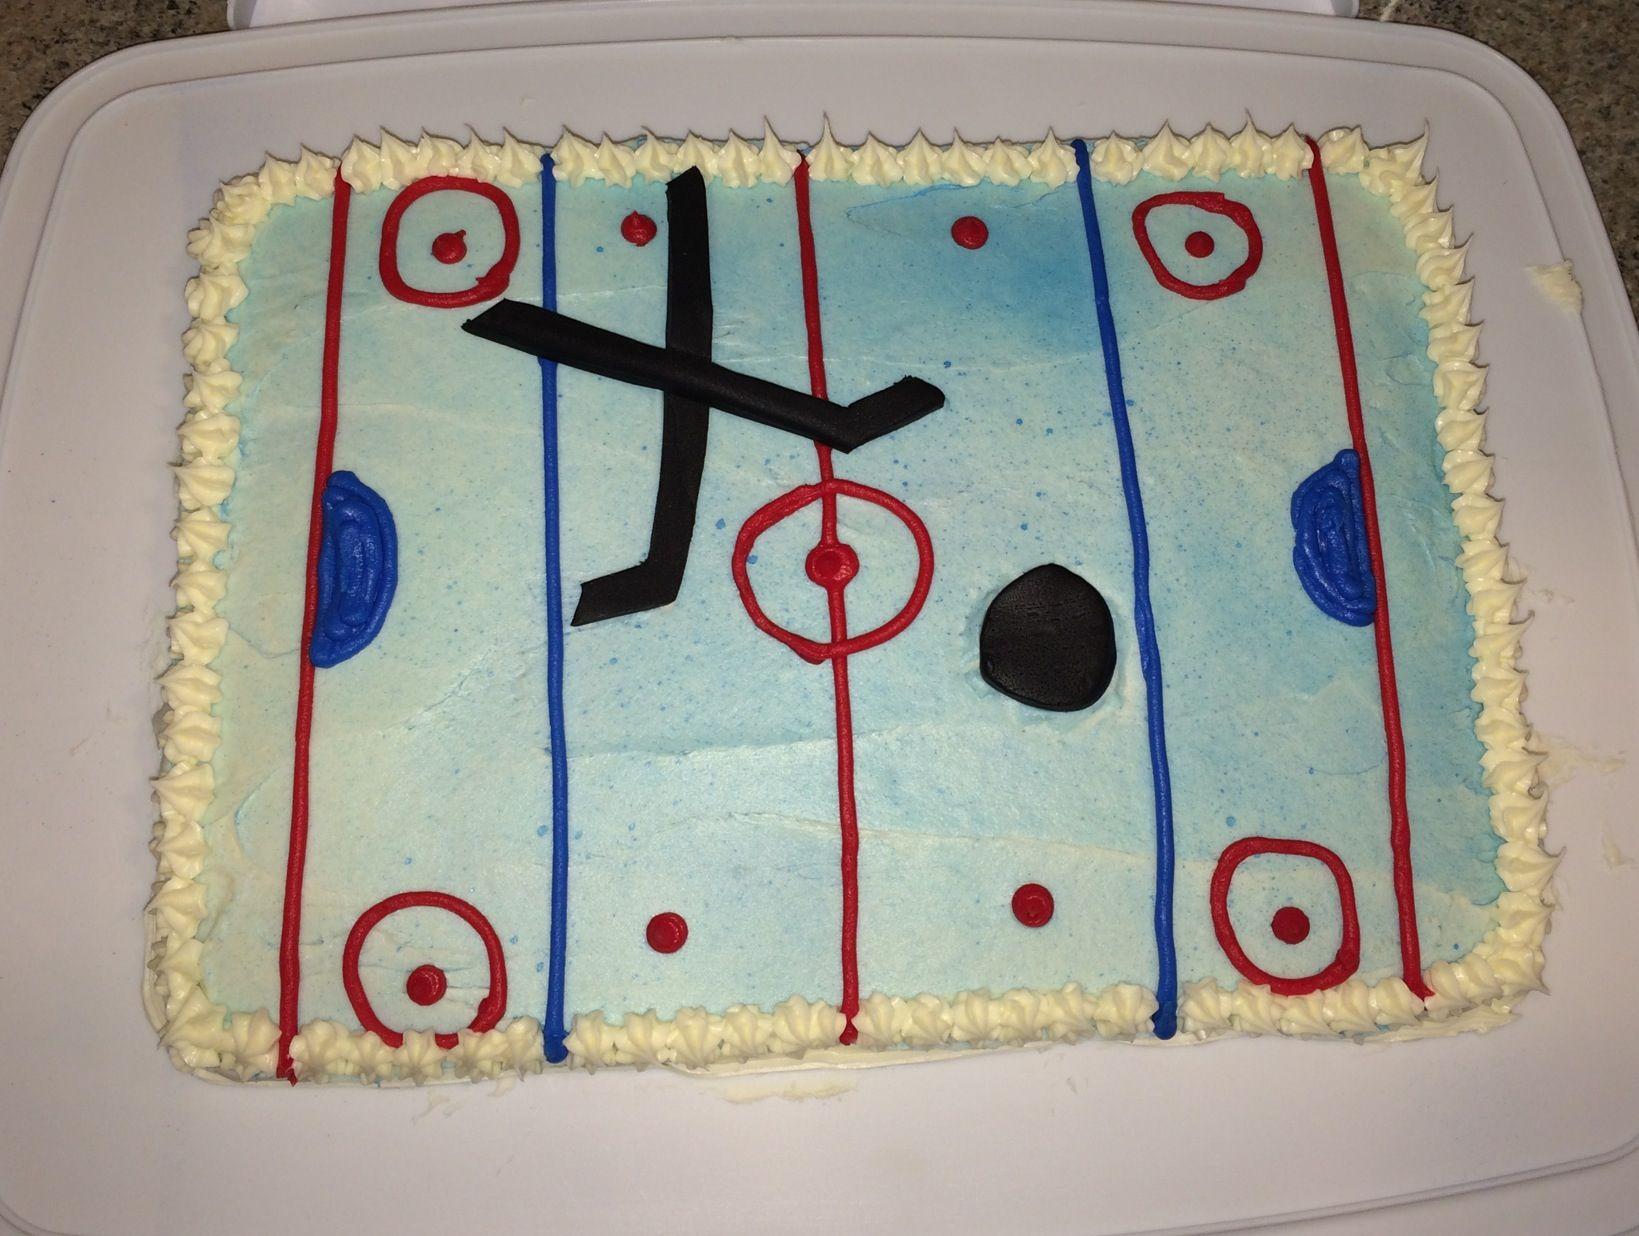 Easy Hockey Fan Cake Puck And Sticks Made Of Fondant Hockey Cakes Cake Decorating Cake